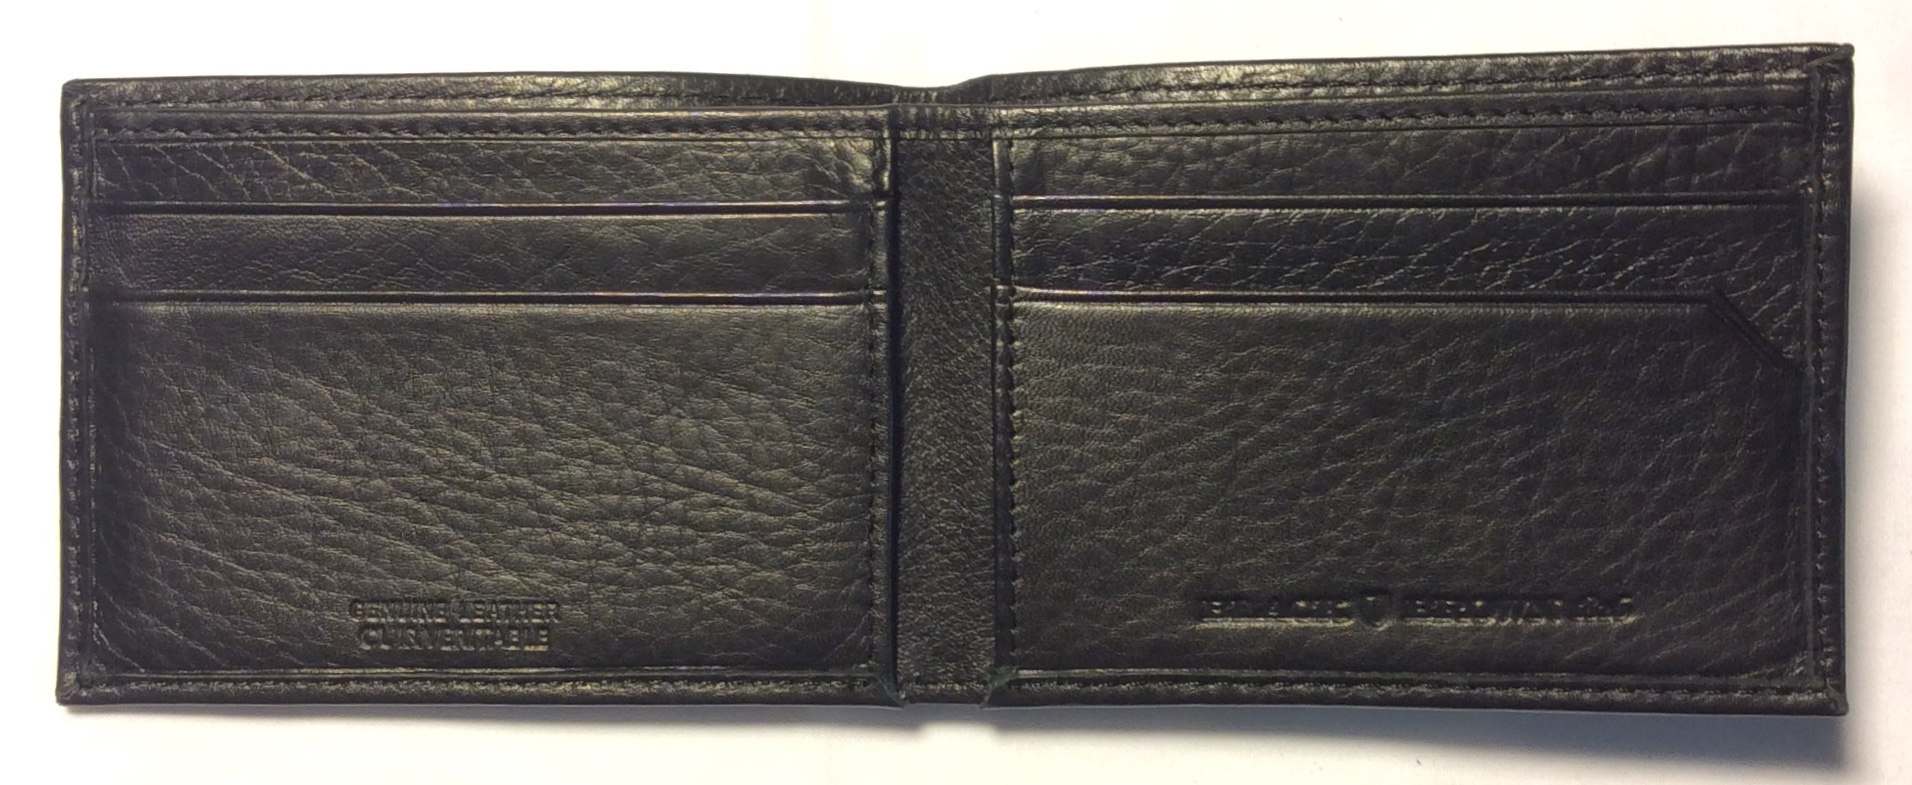 Black Brown 1826 Black leather